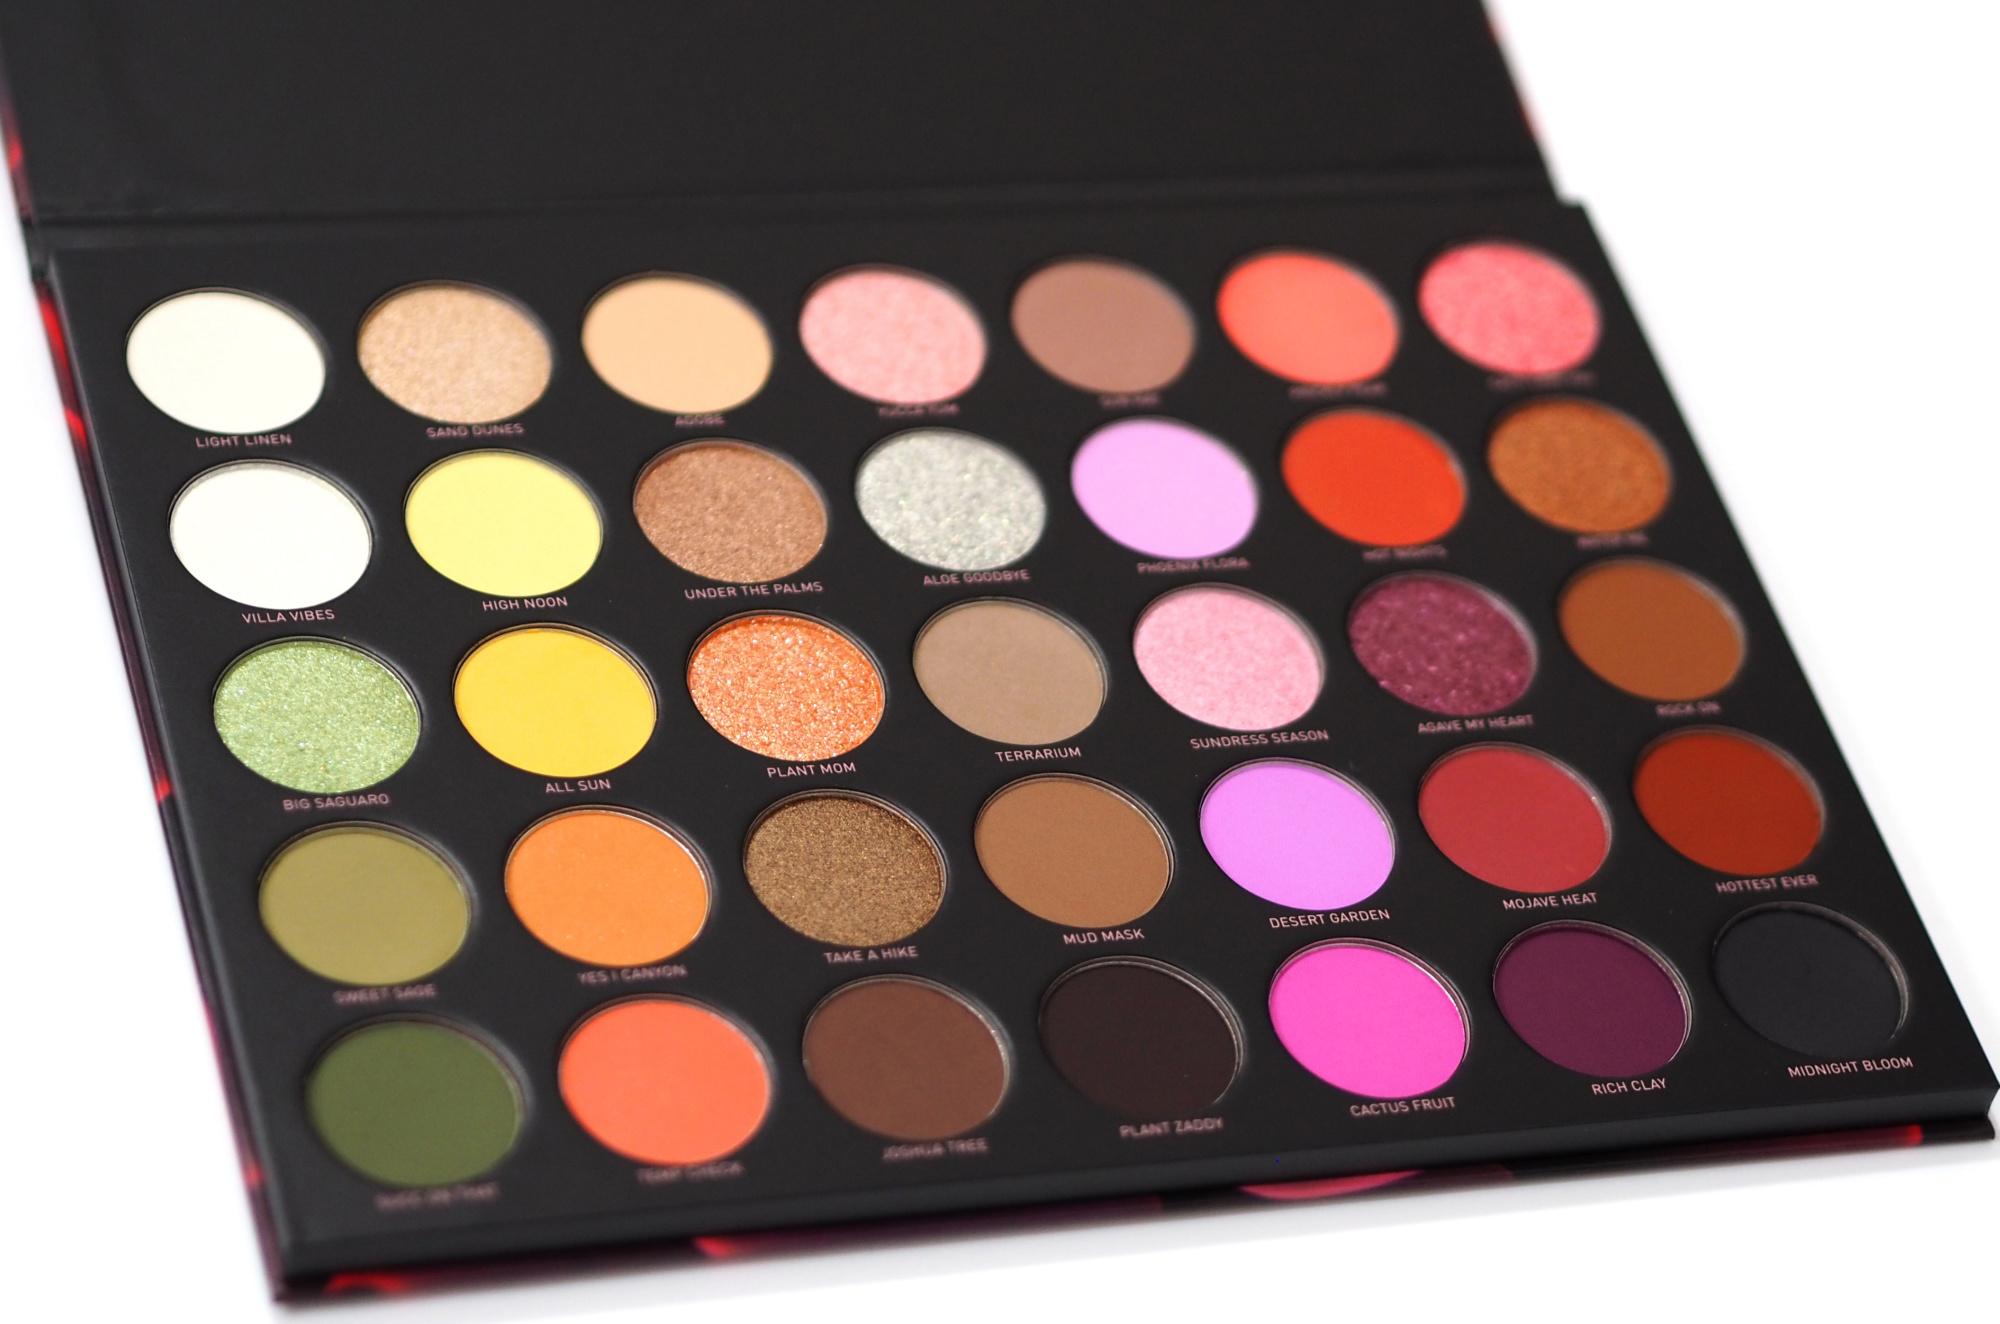 Morphe 35D Desert Bouquet Eyeshadow Palette